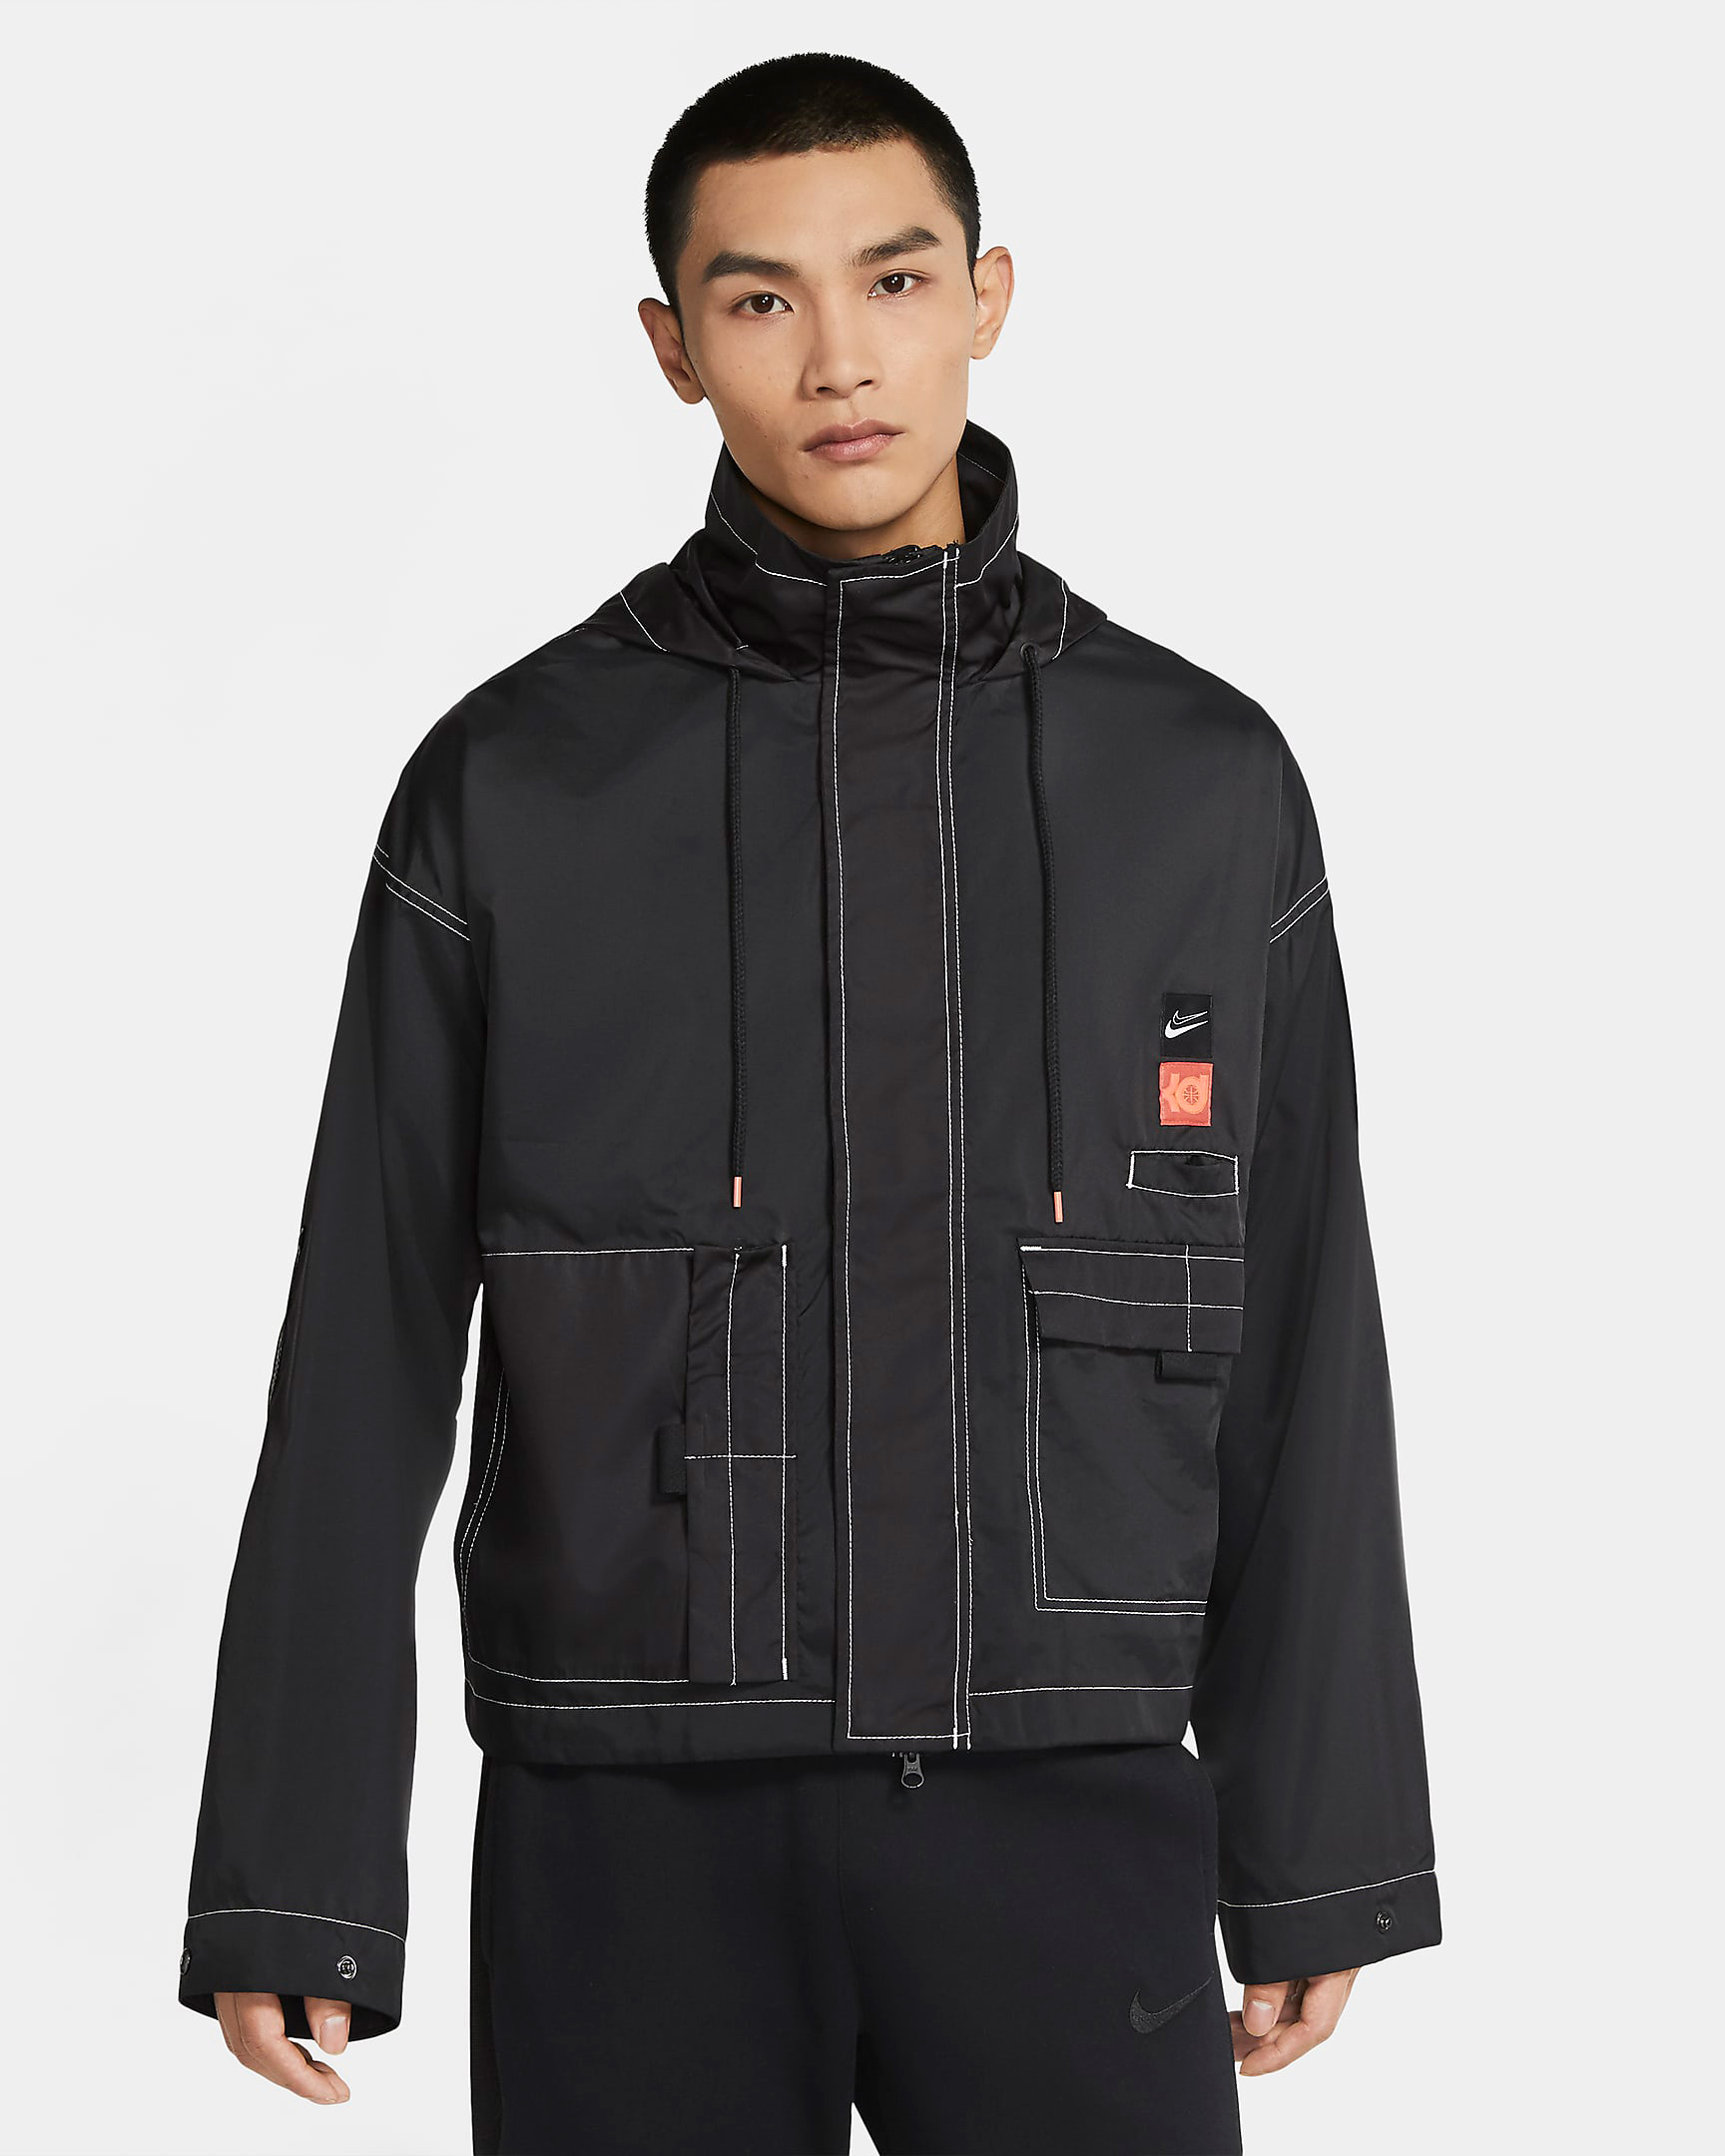 nike-kd-14-black-jacket-1